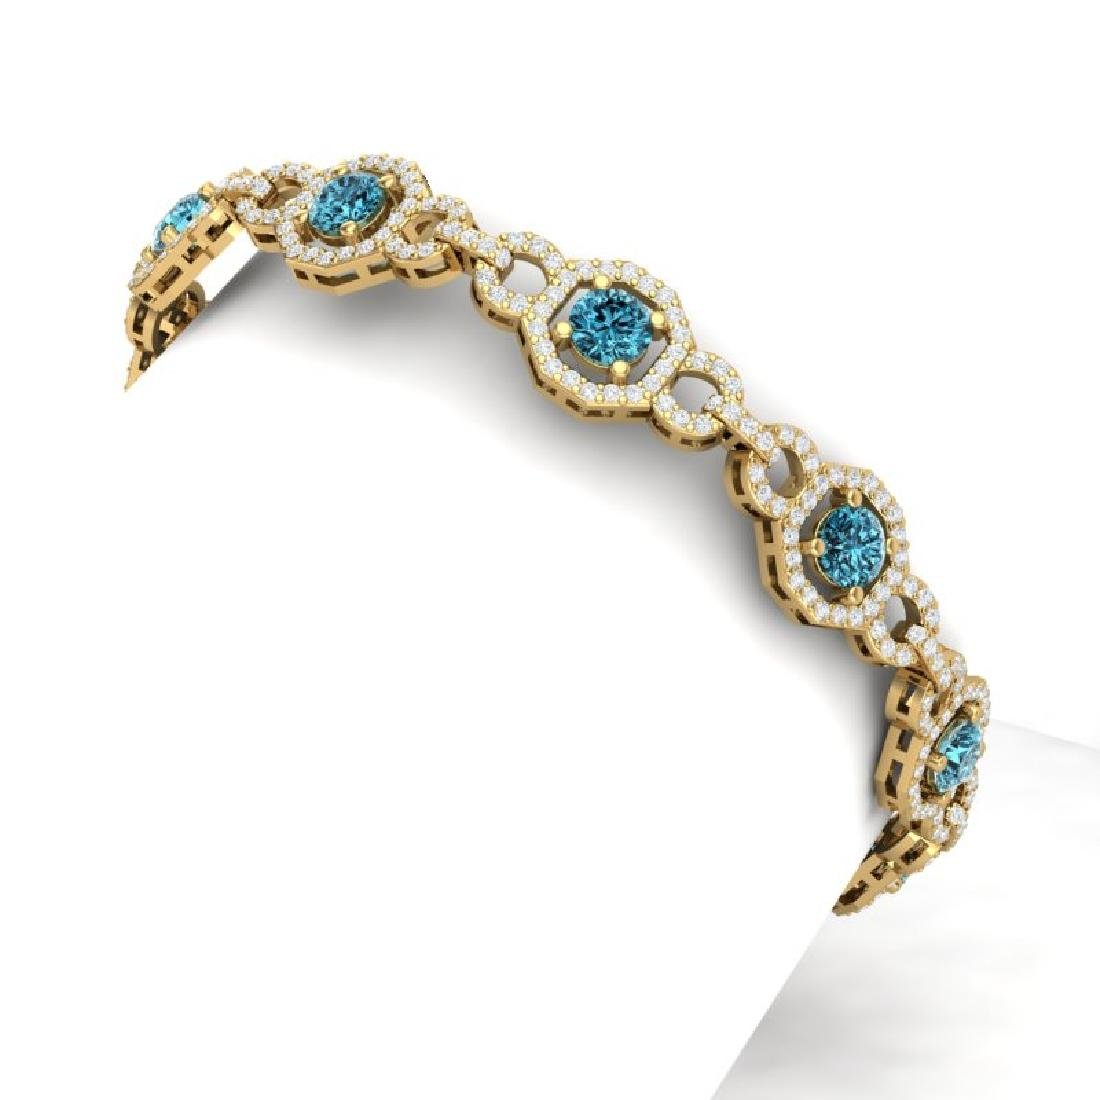 12 CTW SI/I Intense Blue And White Diamond Bracelet 18K